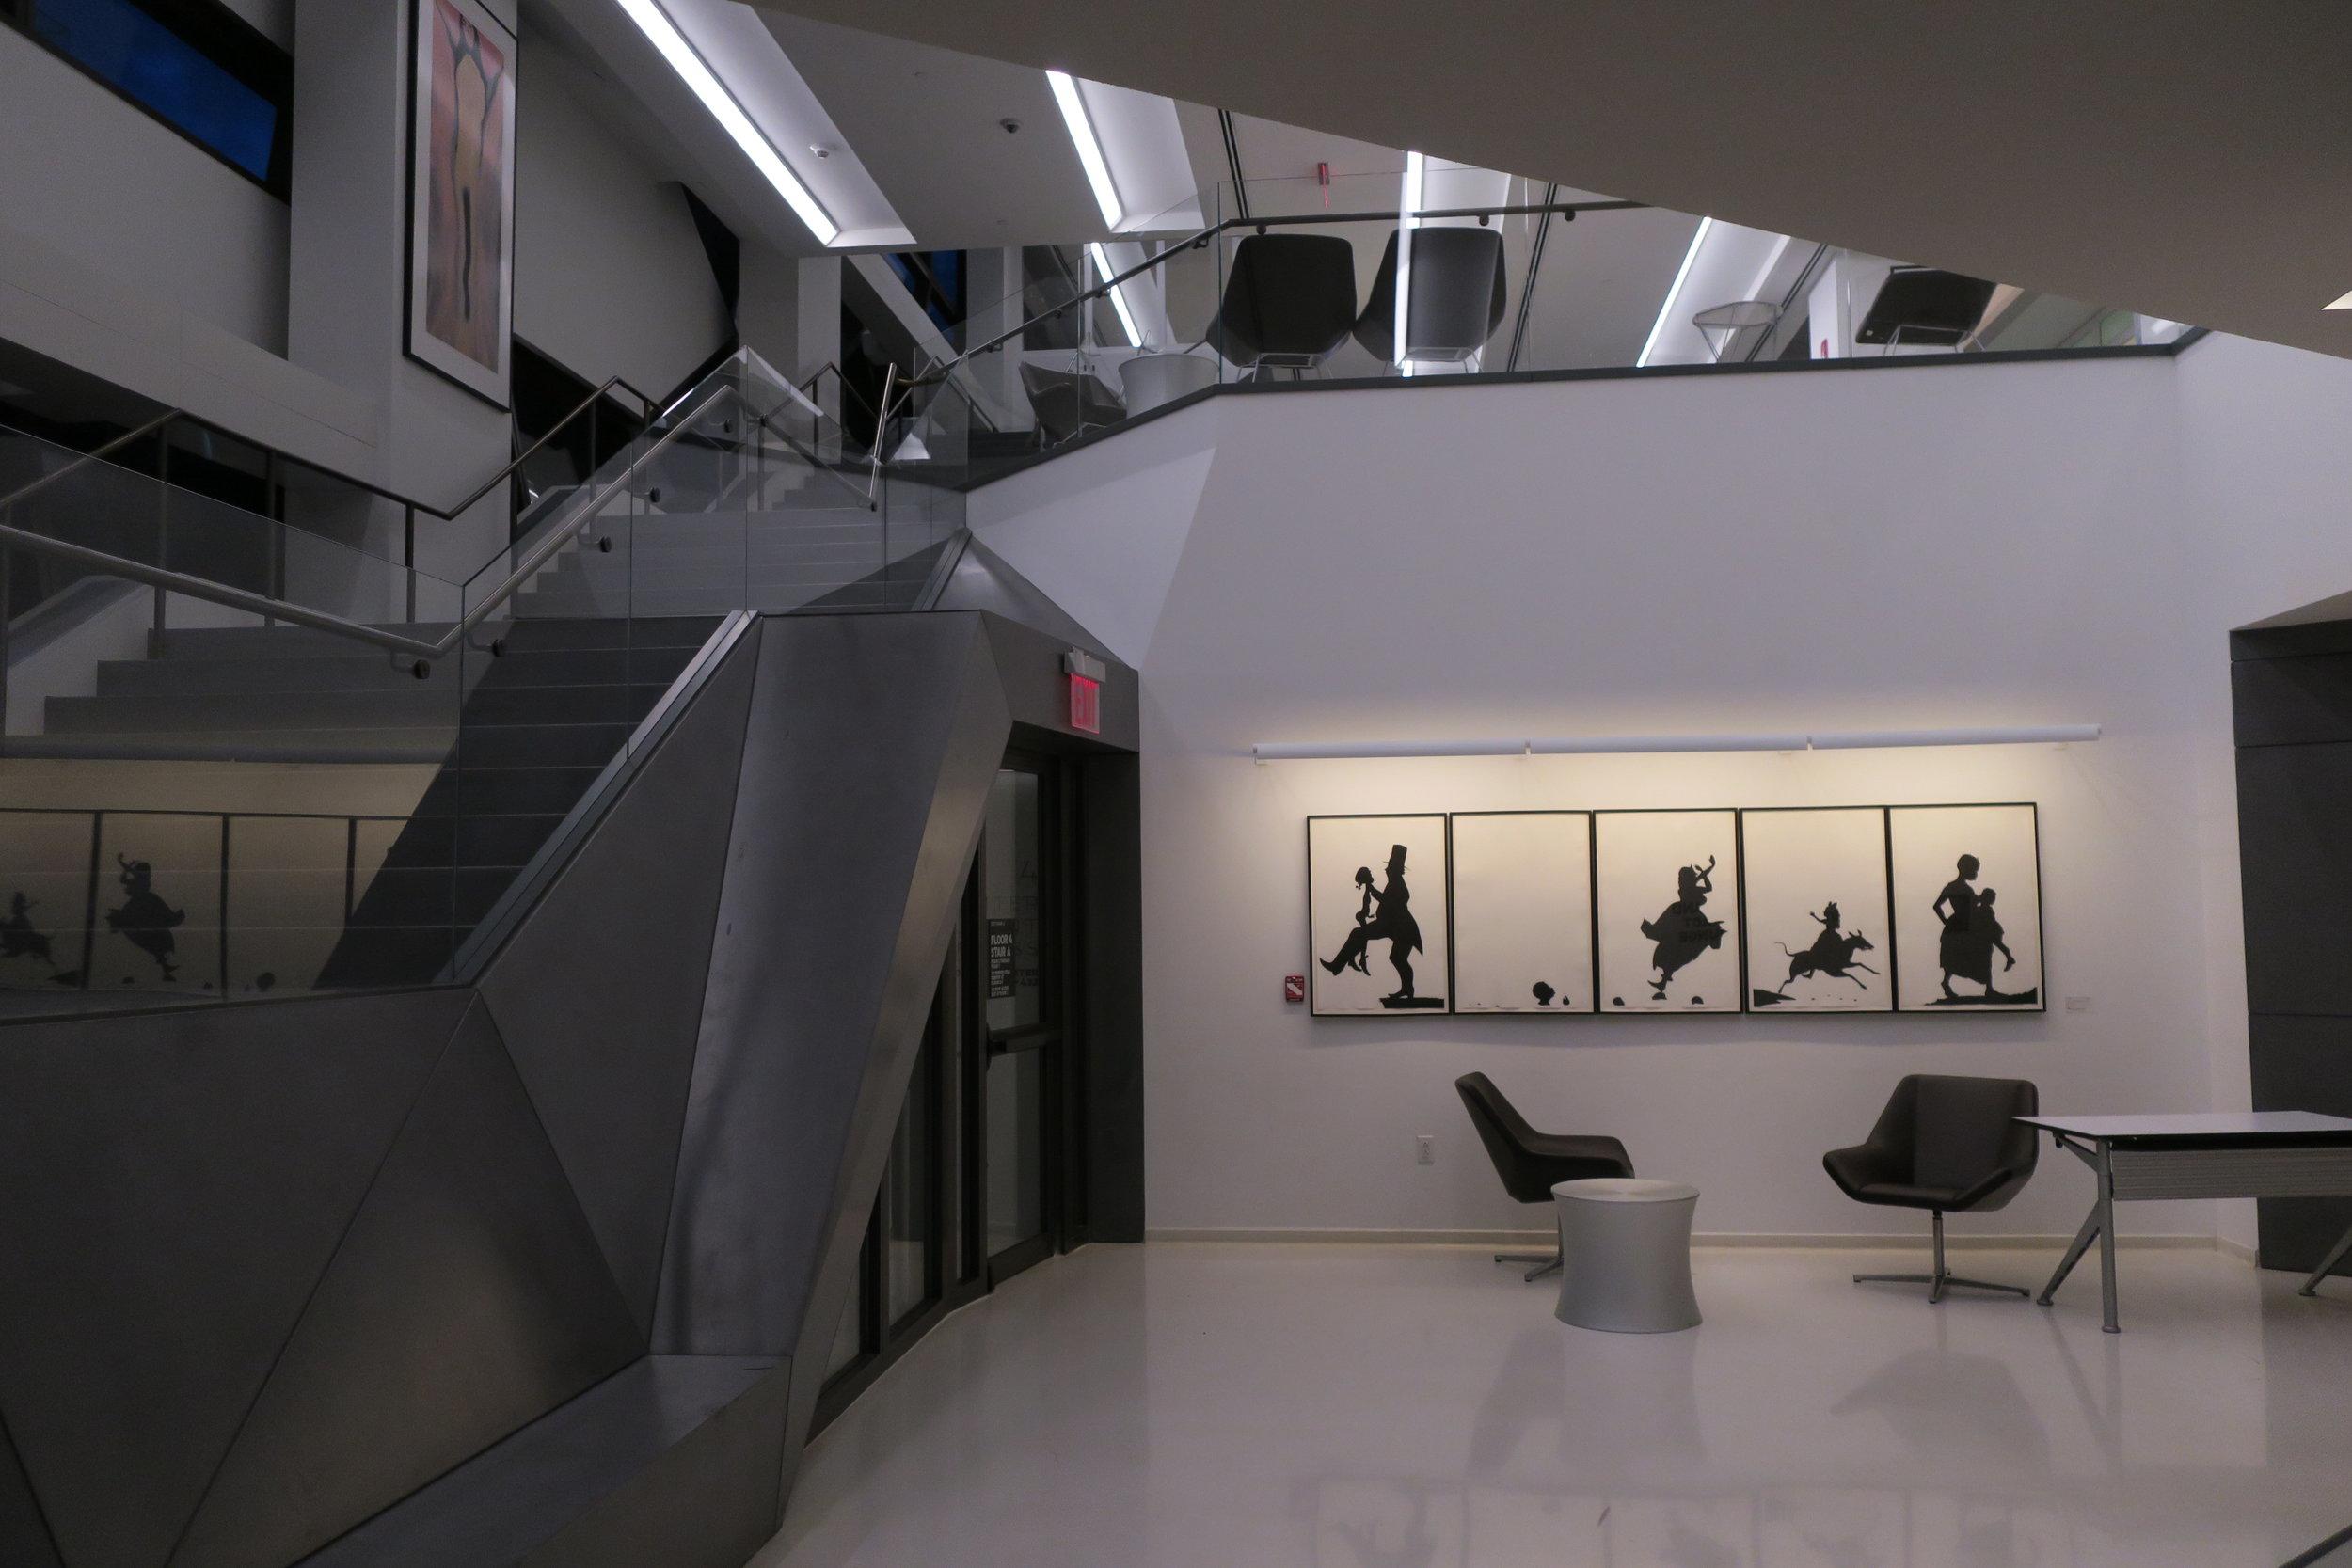 Kara Walker installation at The New School University Center, 63 Fifth Avenue, New York City